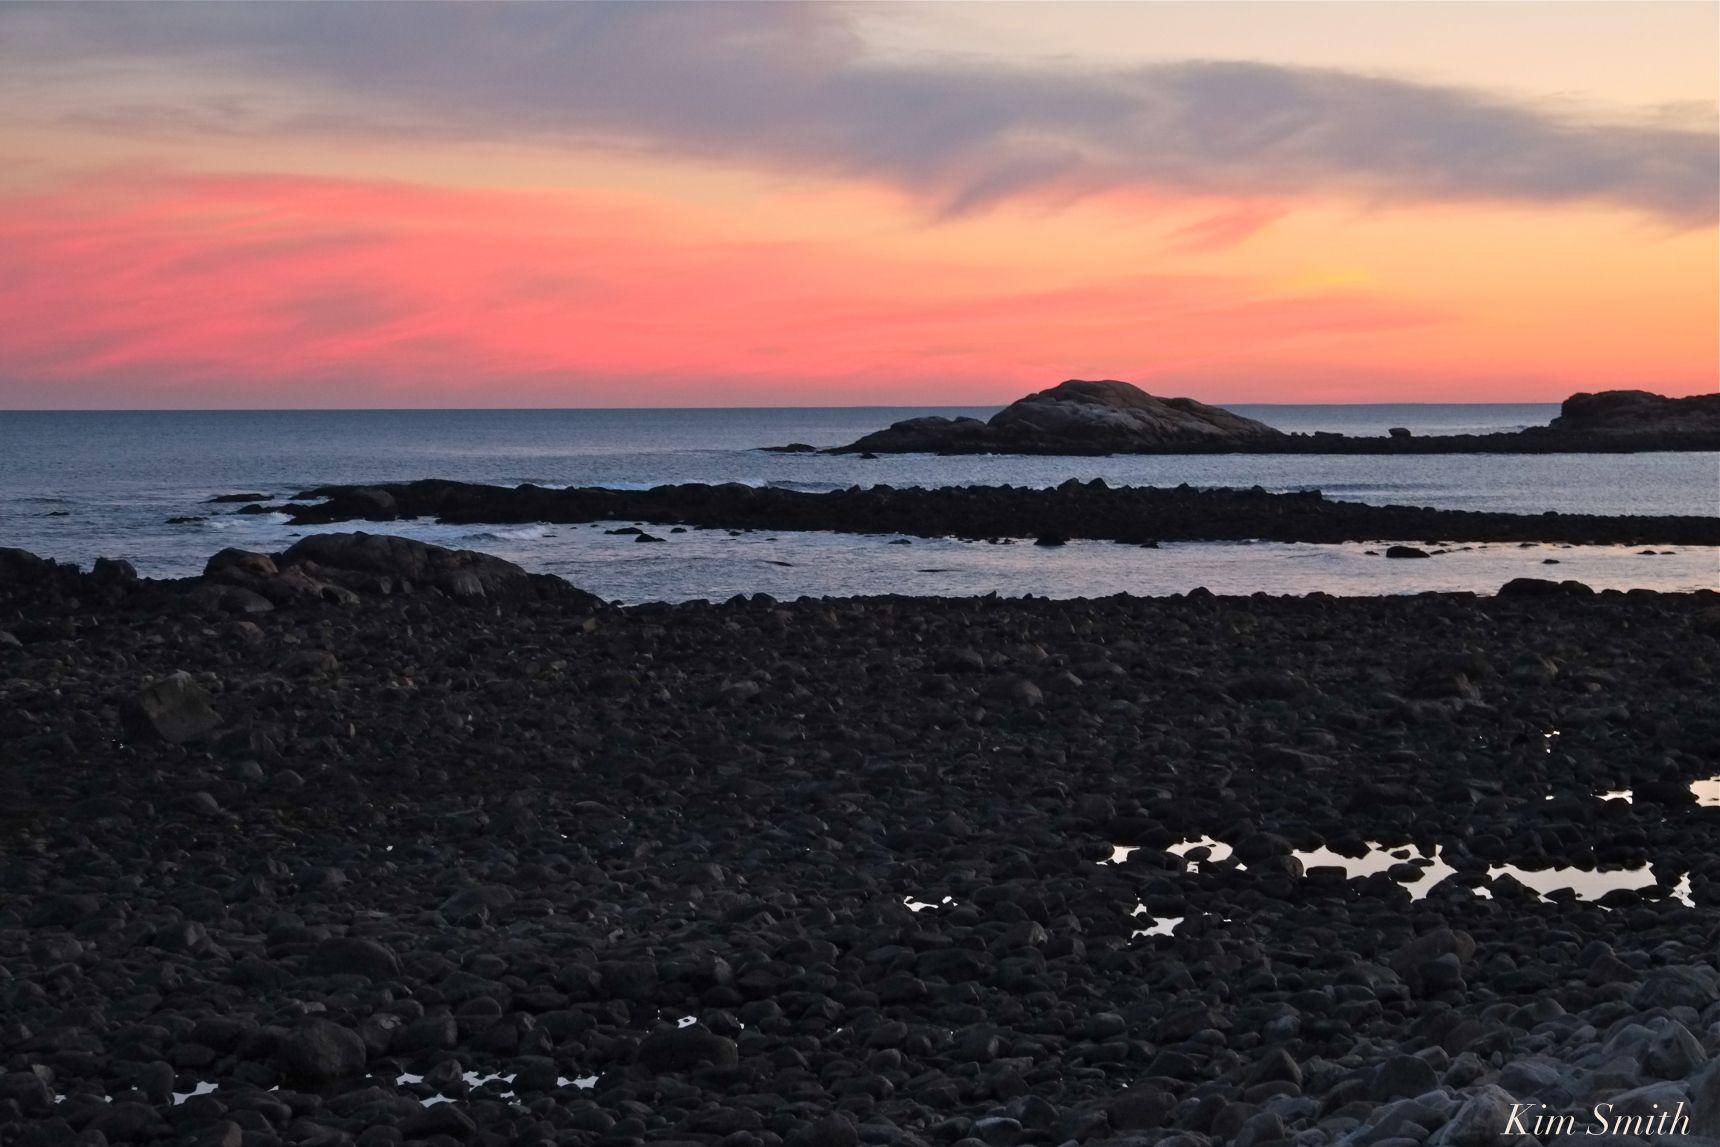 Wordpress Com Sunset Colors Pink Sunset Sunrise Sunset Sunset sea pink clouds coast rocks